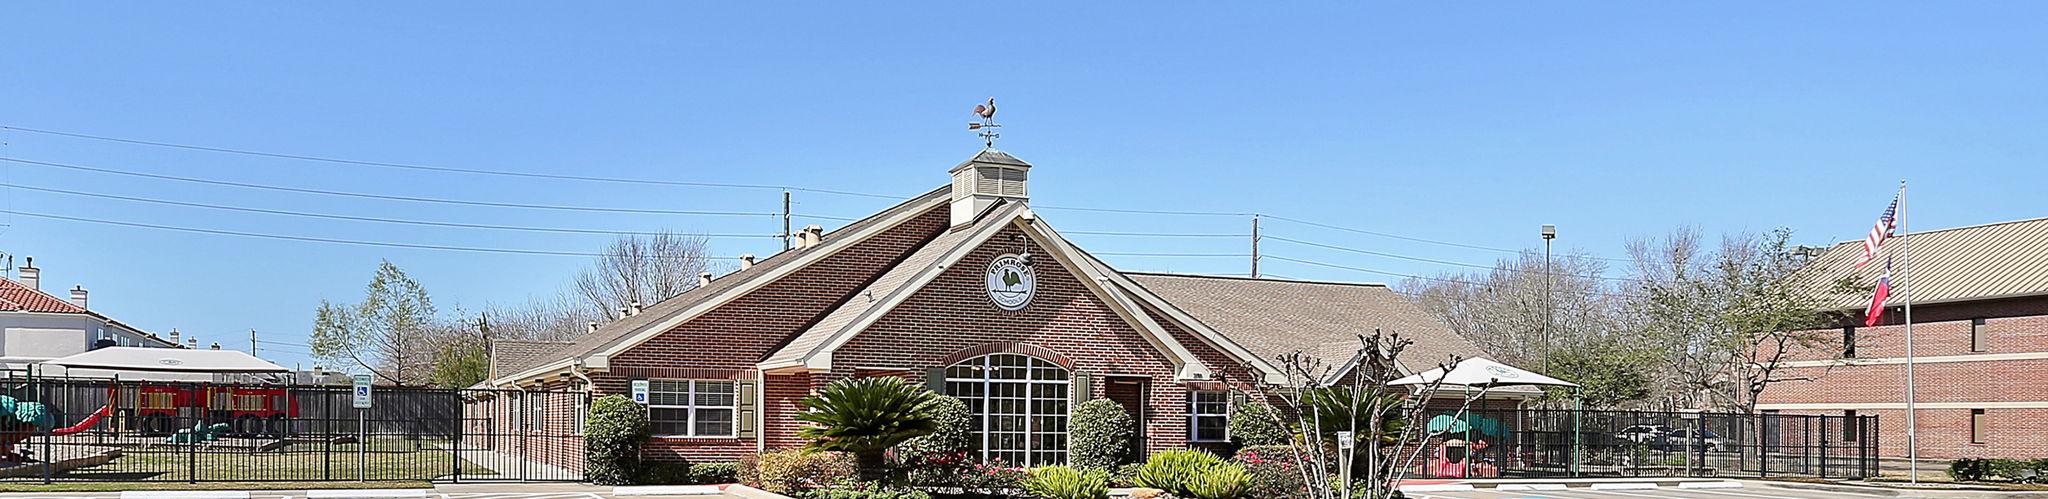 Exterior of a Primrose School of Eldridge Parkway